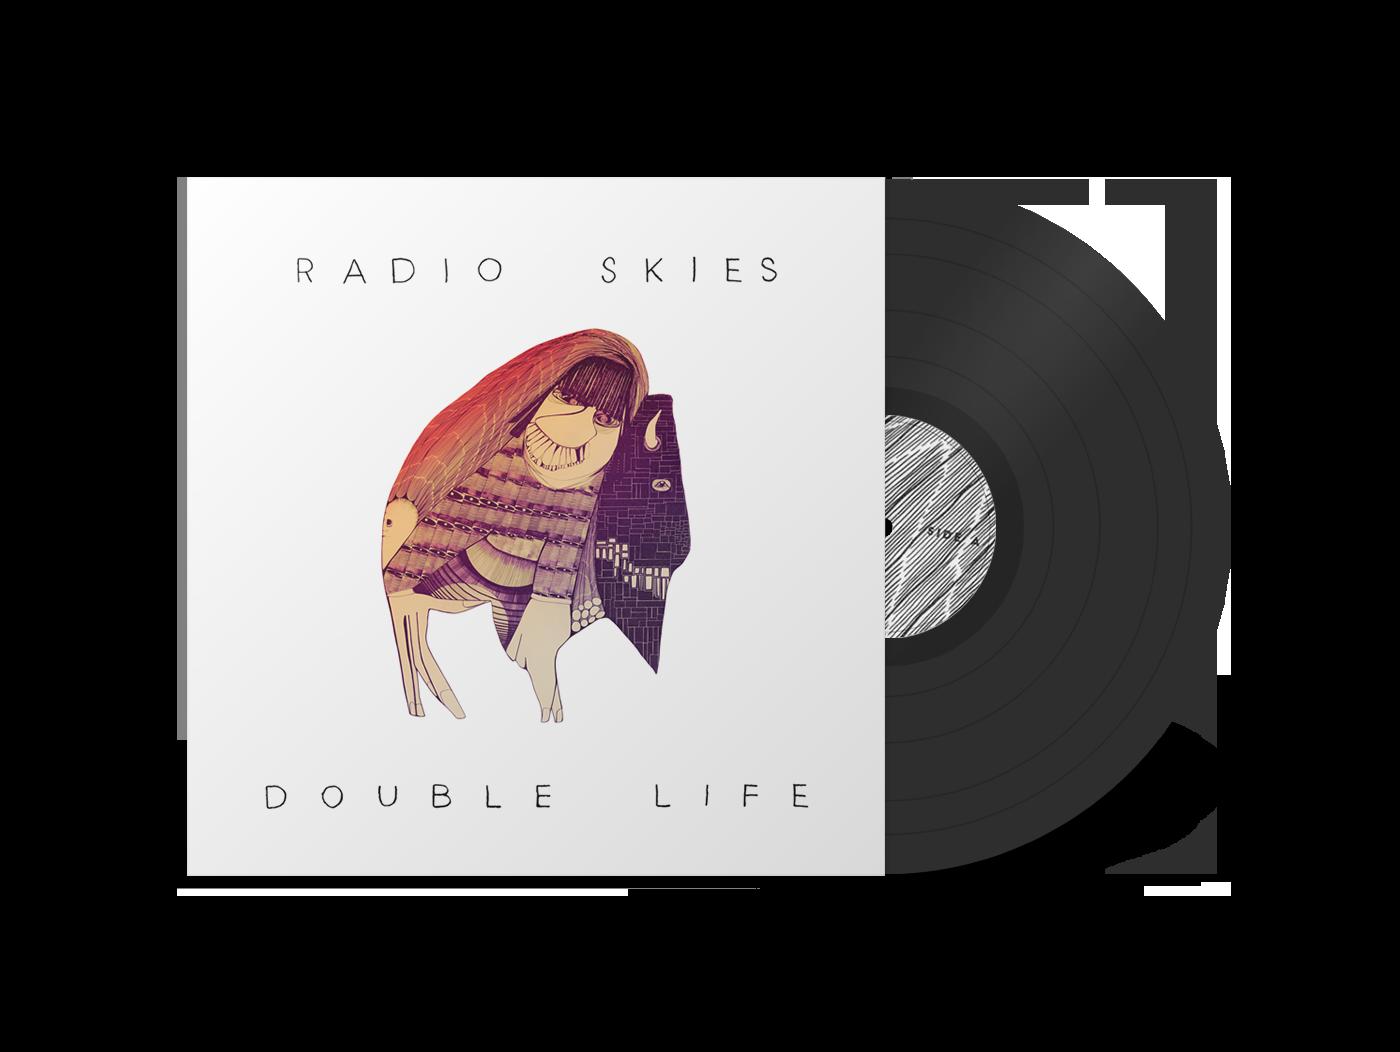 DL as vinyl_trans.png